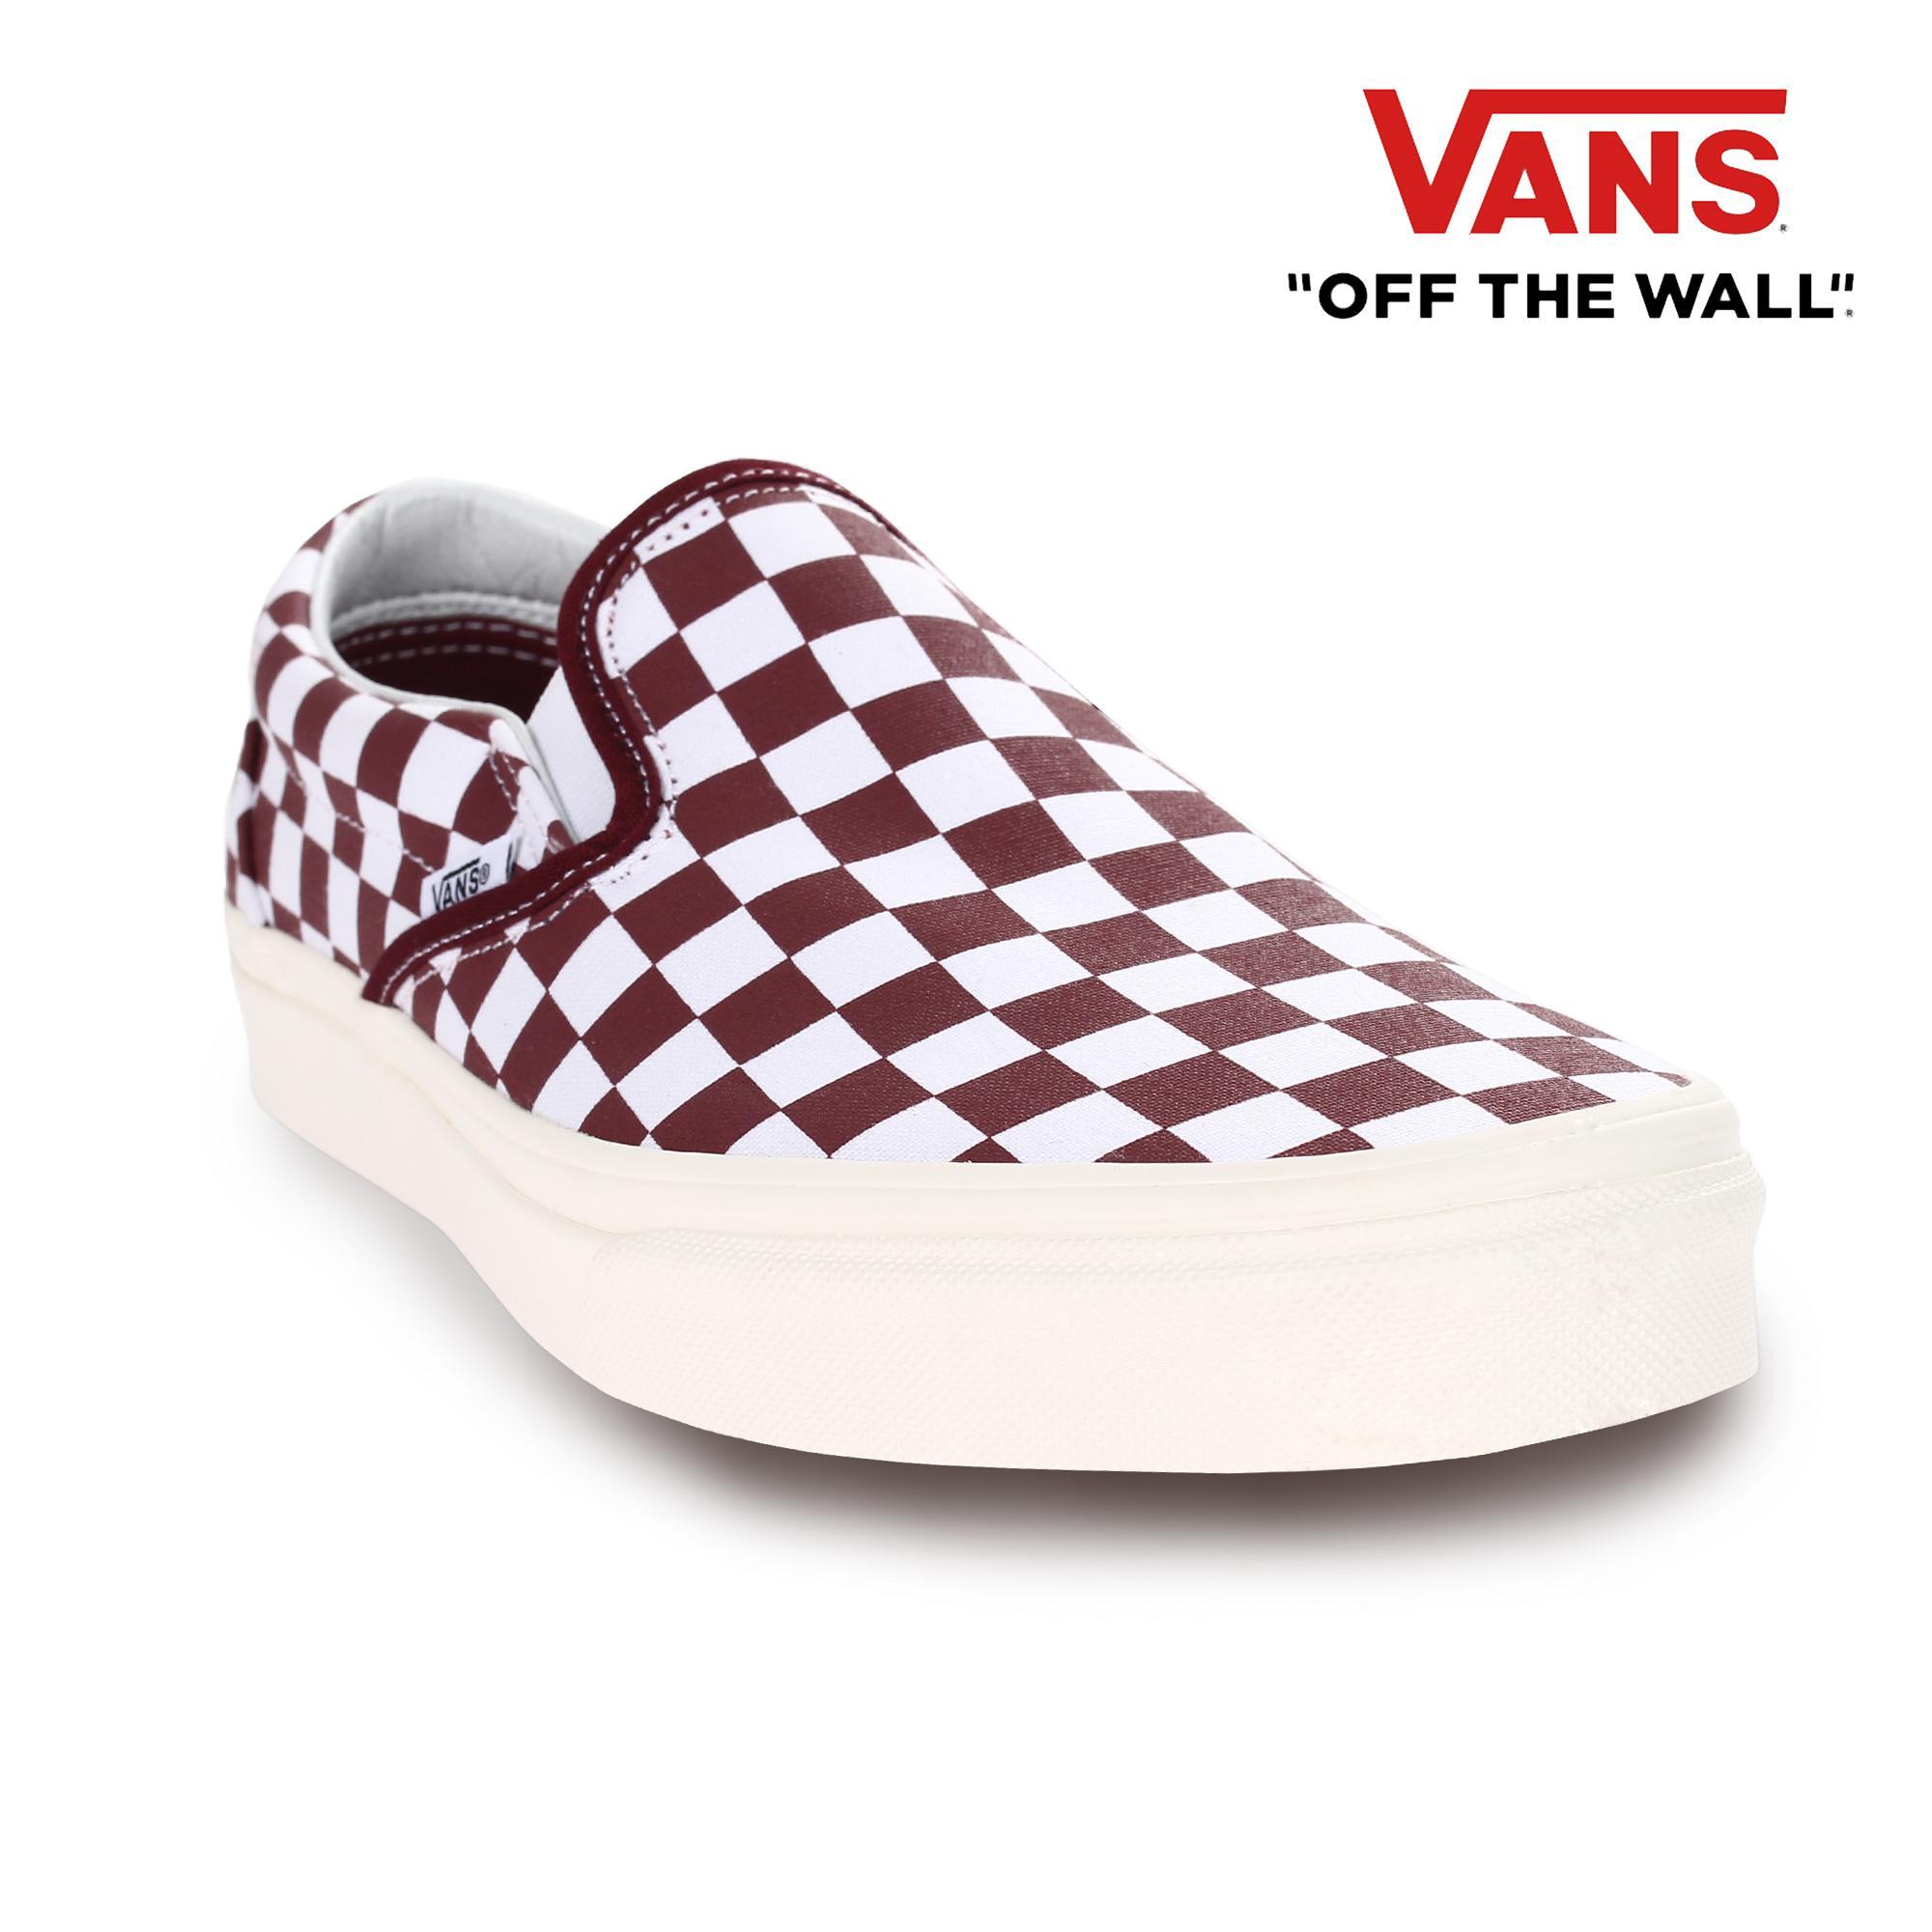 authentic shades of a few days away Buy Vans Men Shoes Online | lazada.com.ph